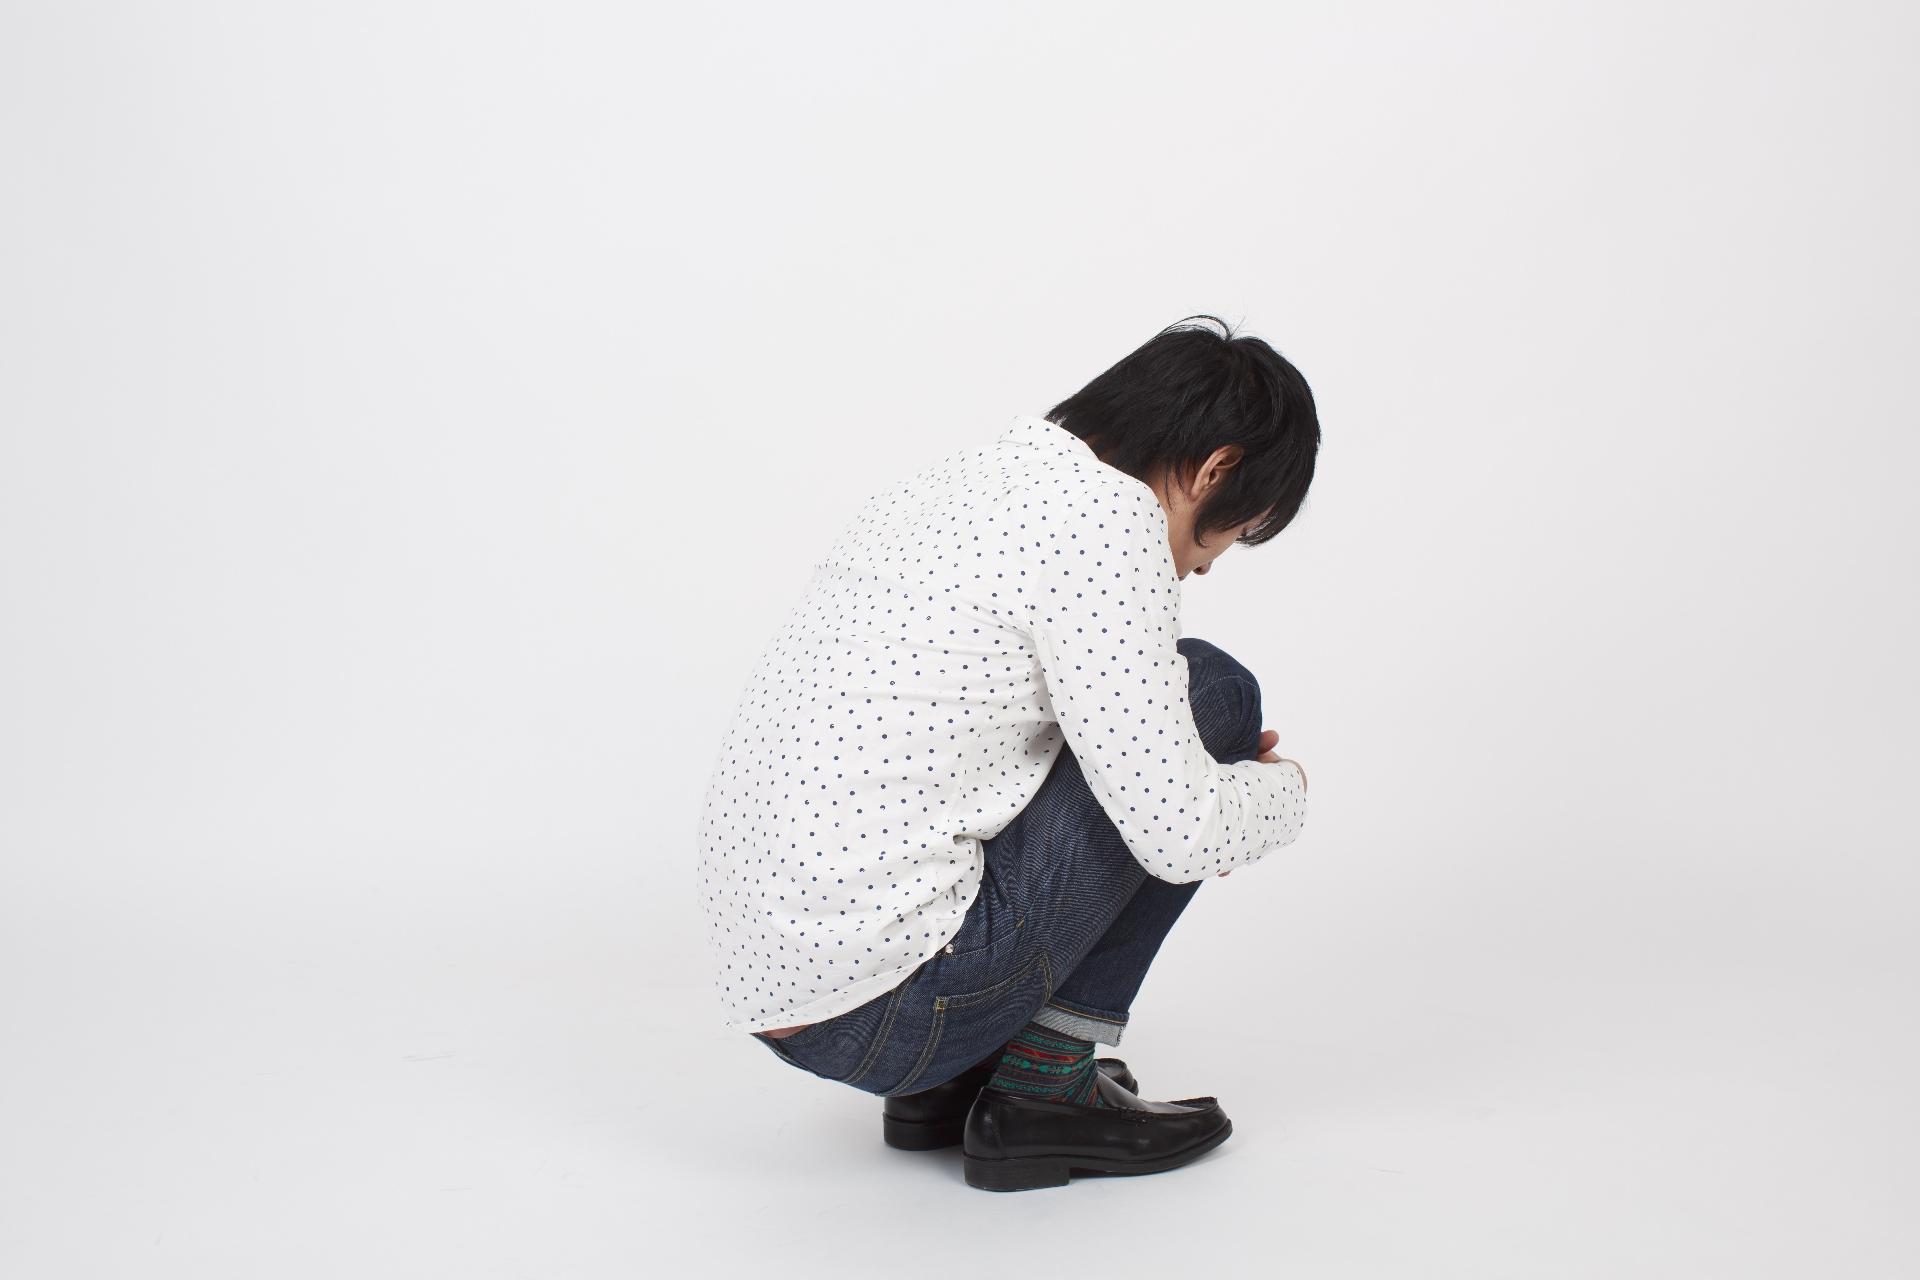 df294e7c1c993237277d5388ac166eb5_m